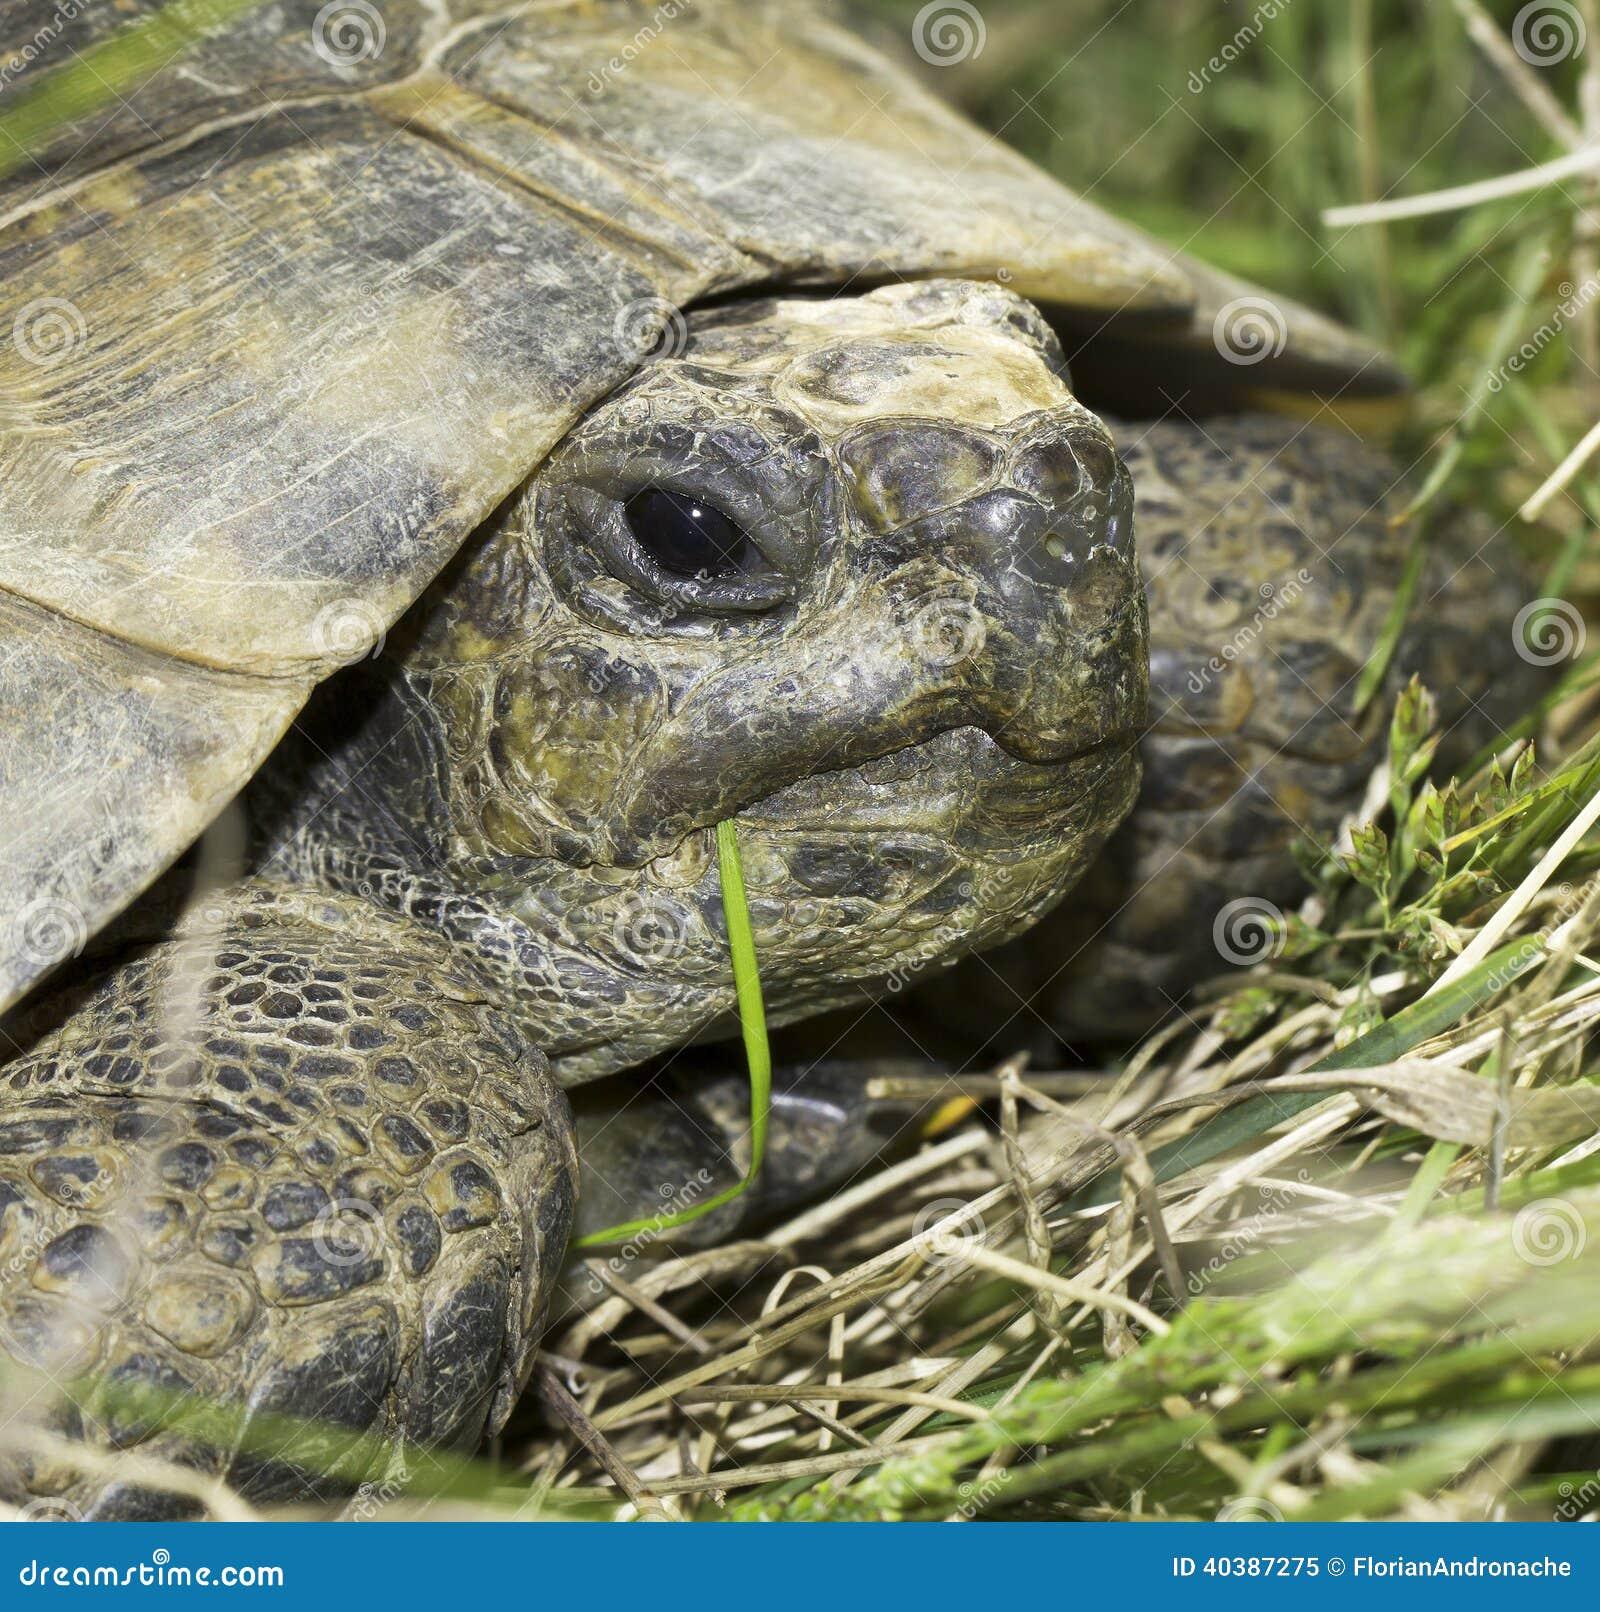 ibera greek tortoise - photo #29